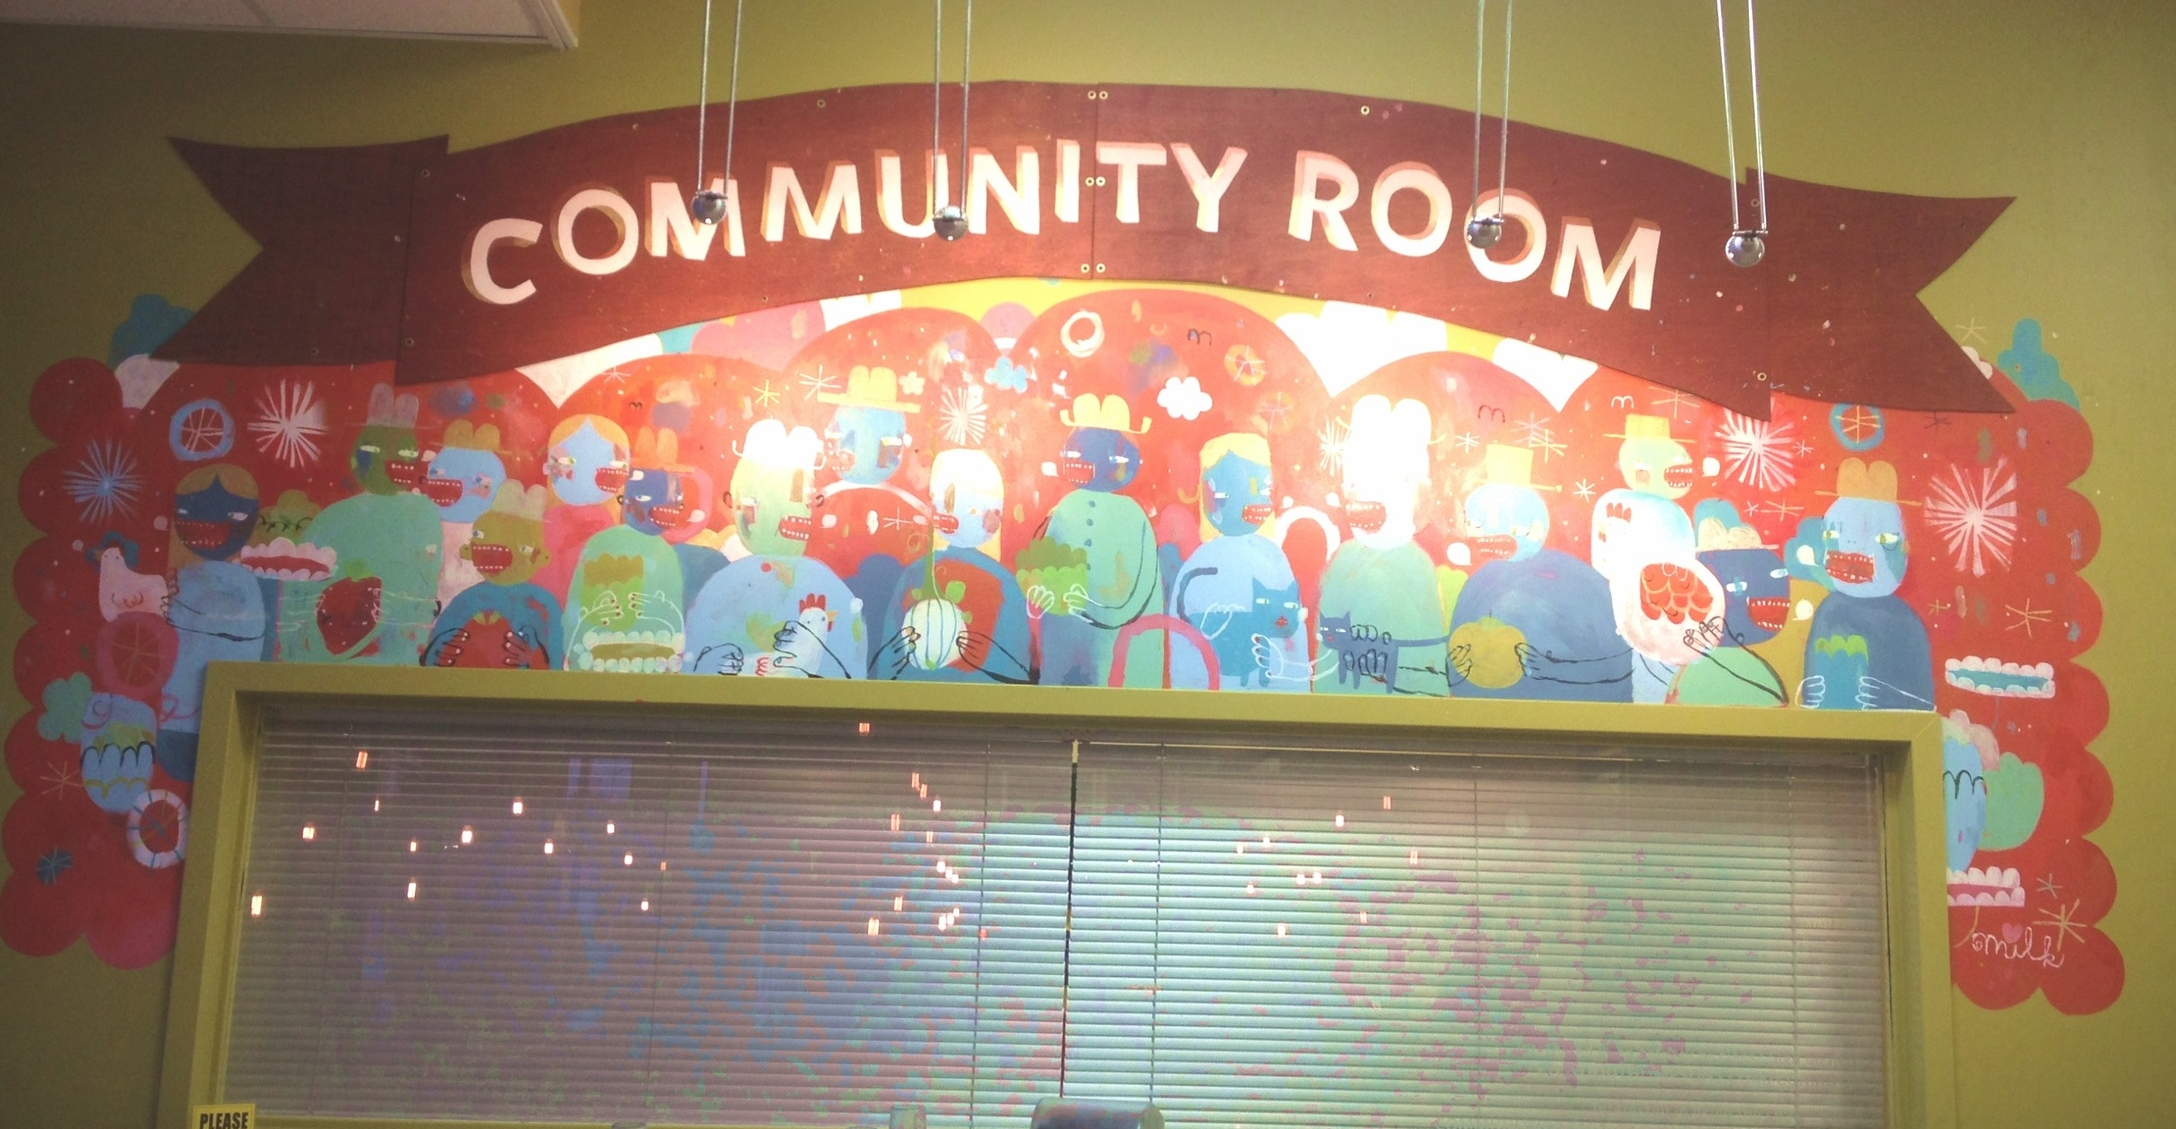 Ellwood Thompson Local Market Community Room, Richmond 2013